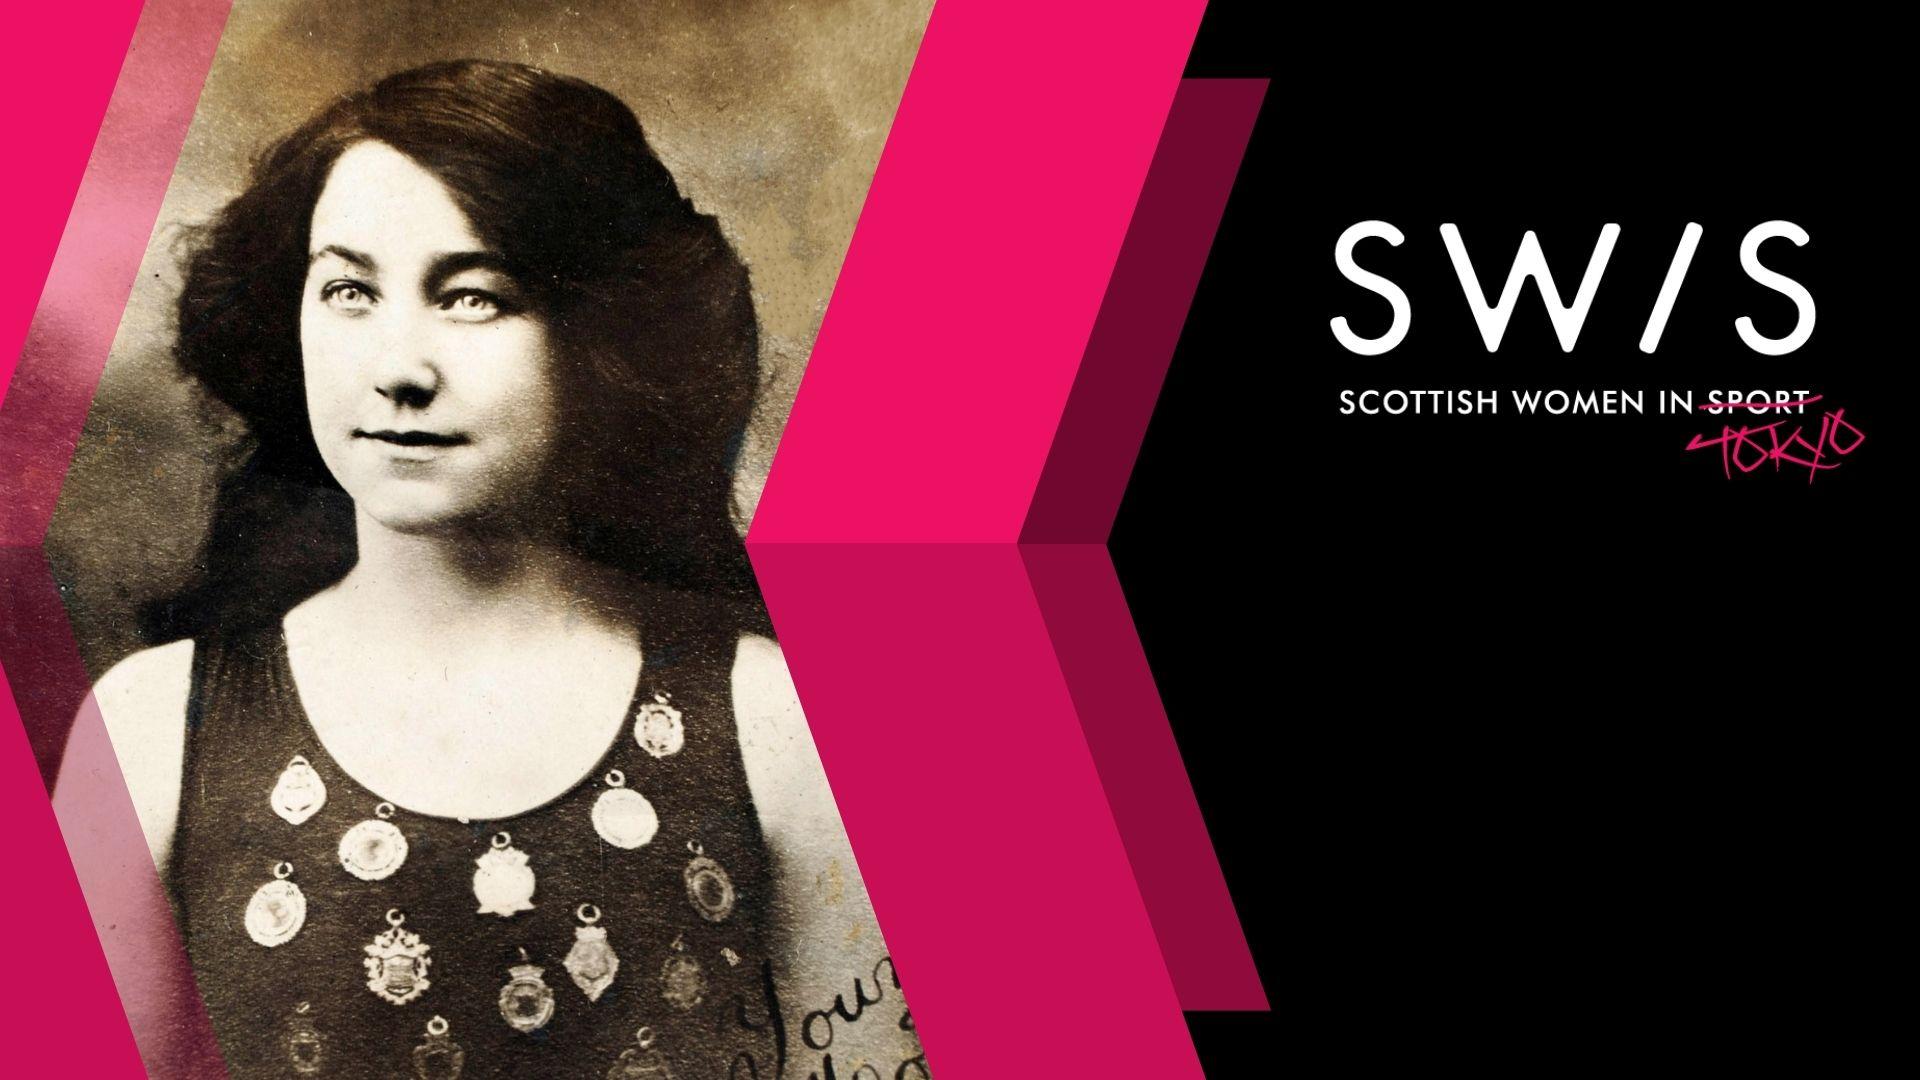 Blog 58: Scottish Women in the Olympics